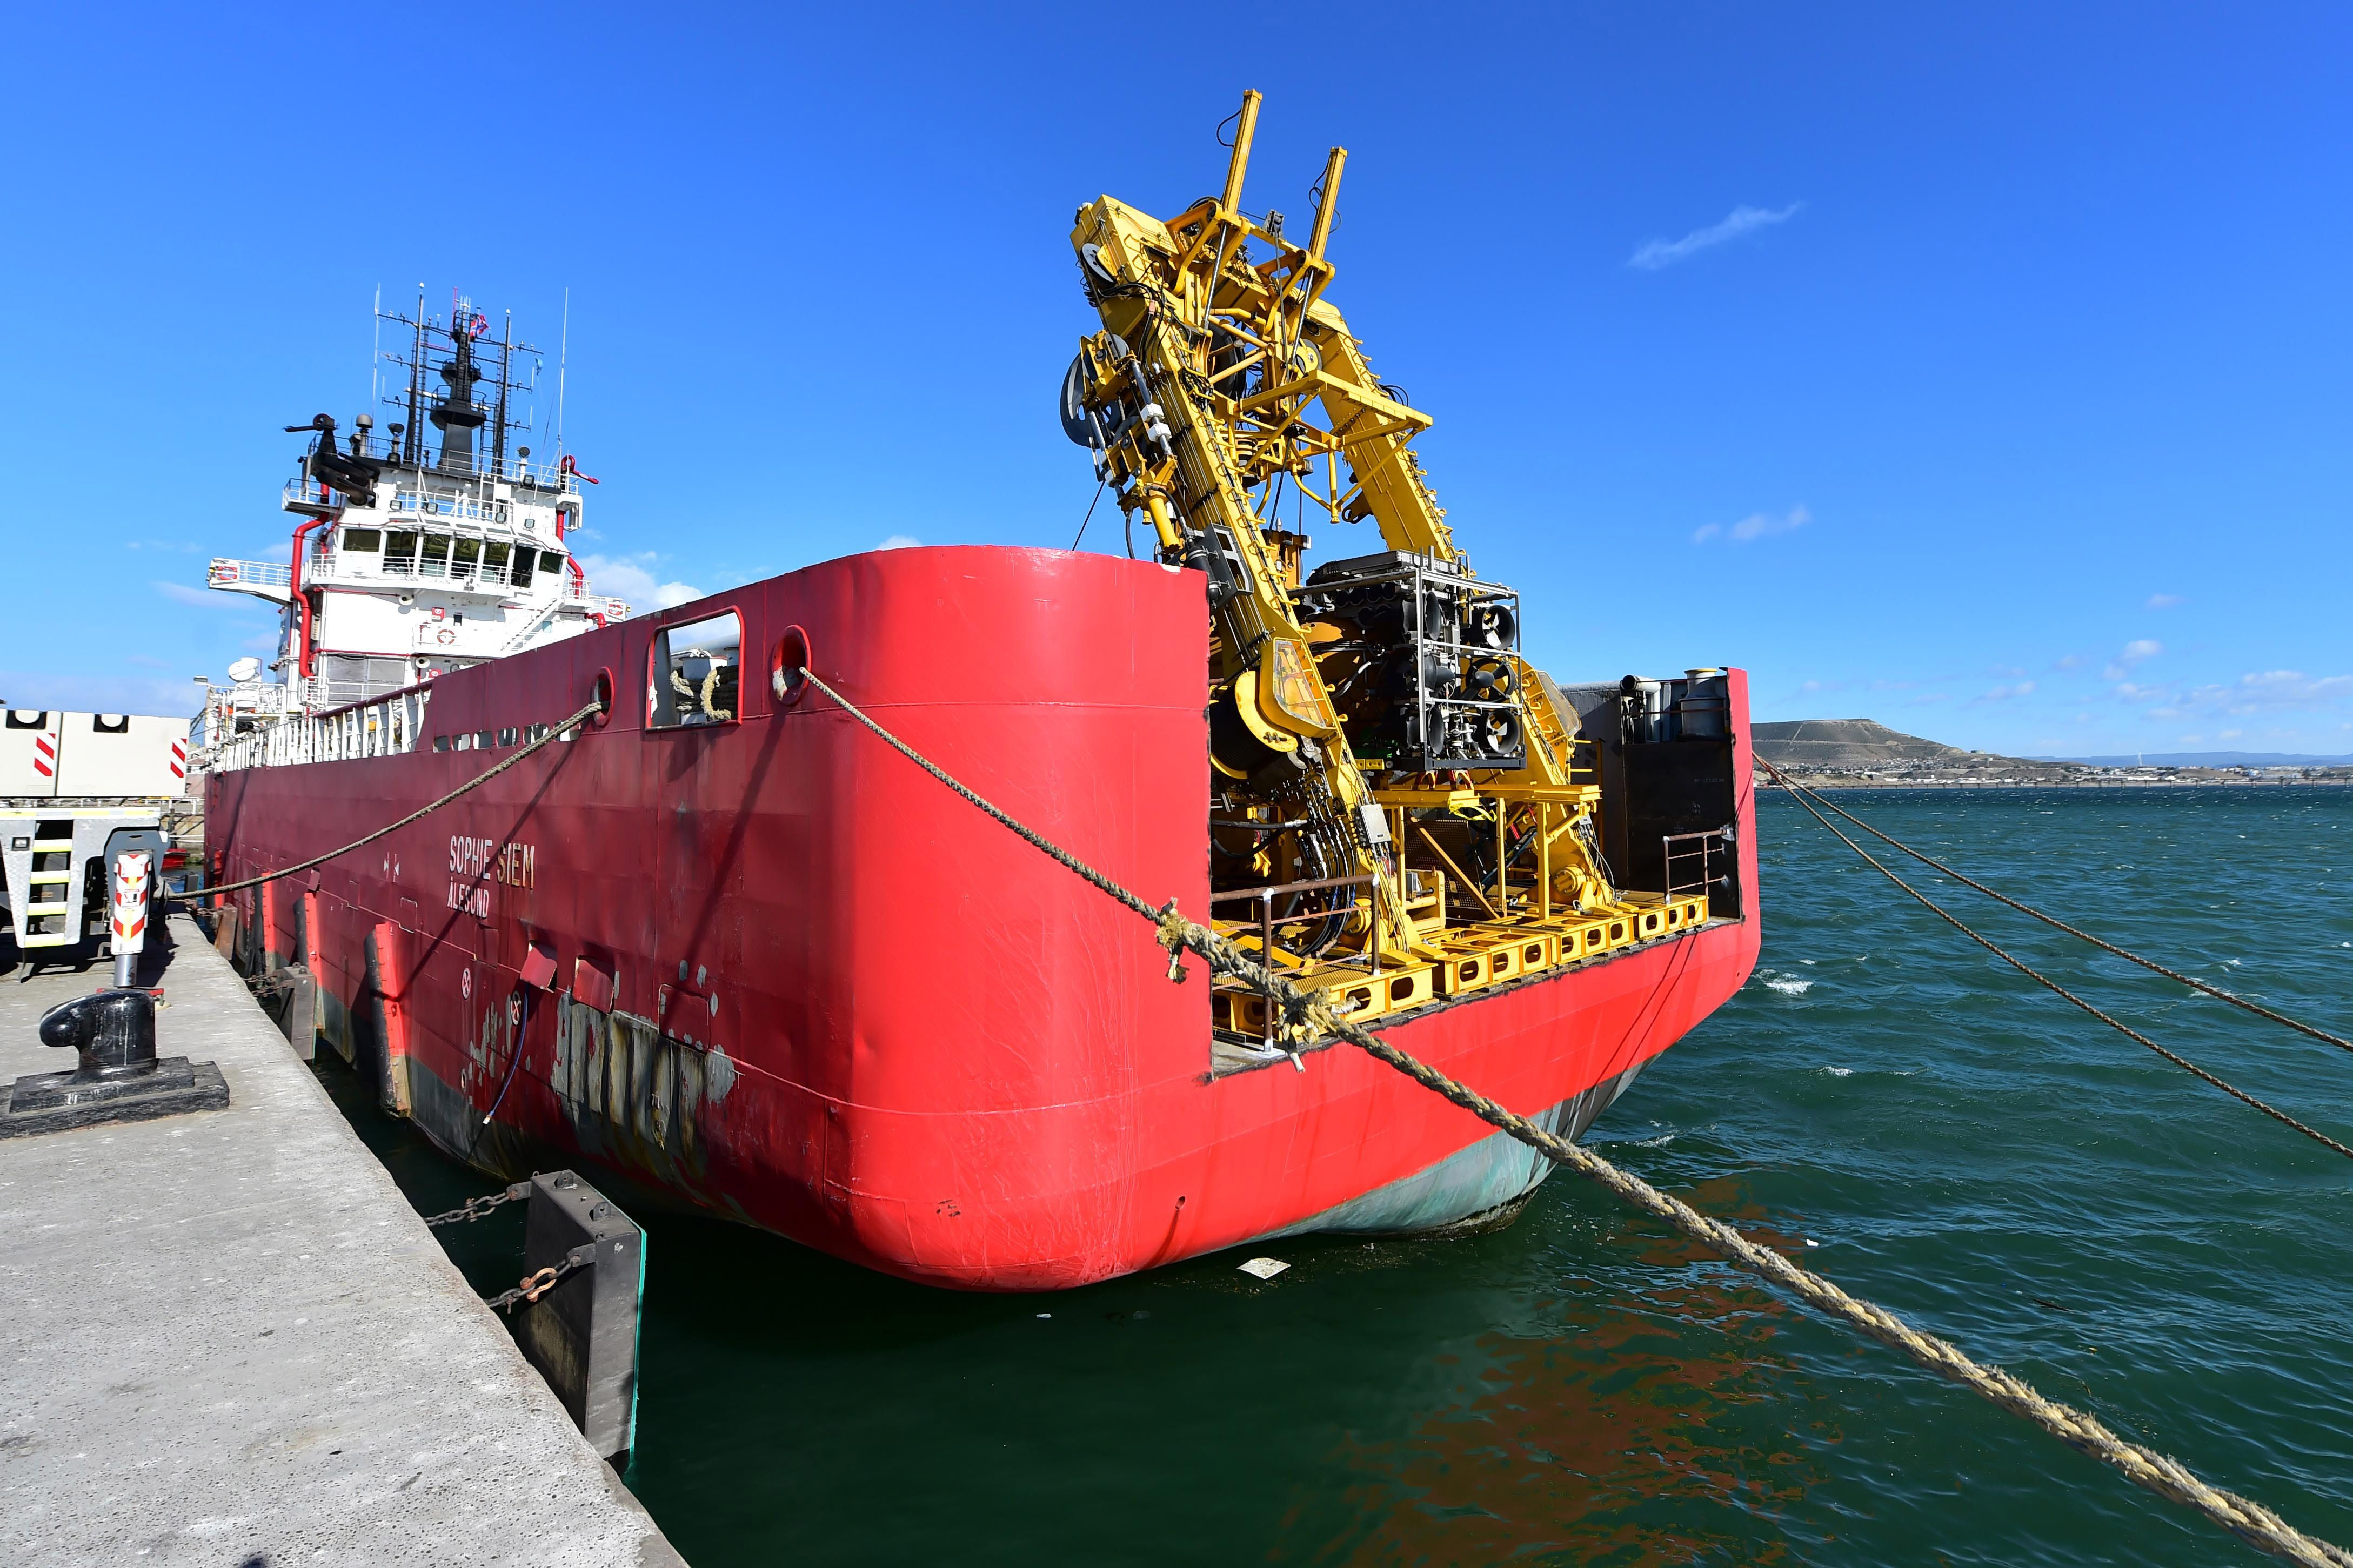 El minisubmarino de EE.UU. se dirige a la zona de búsqueda del ARA San Juan